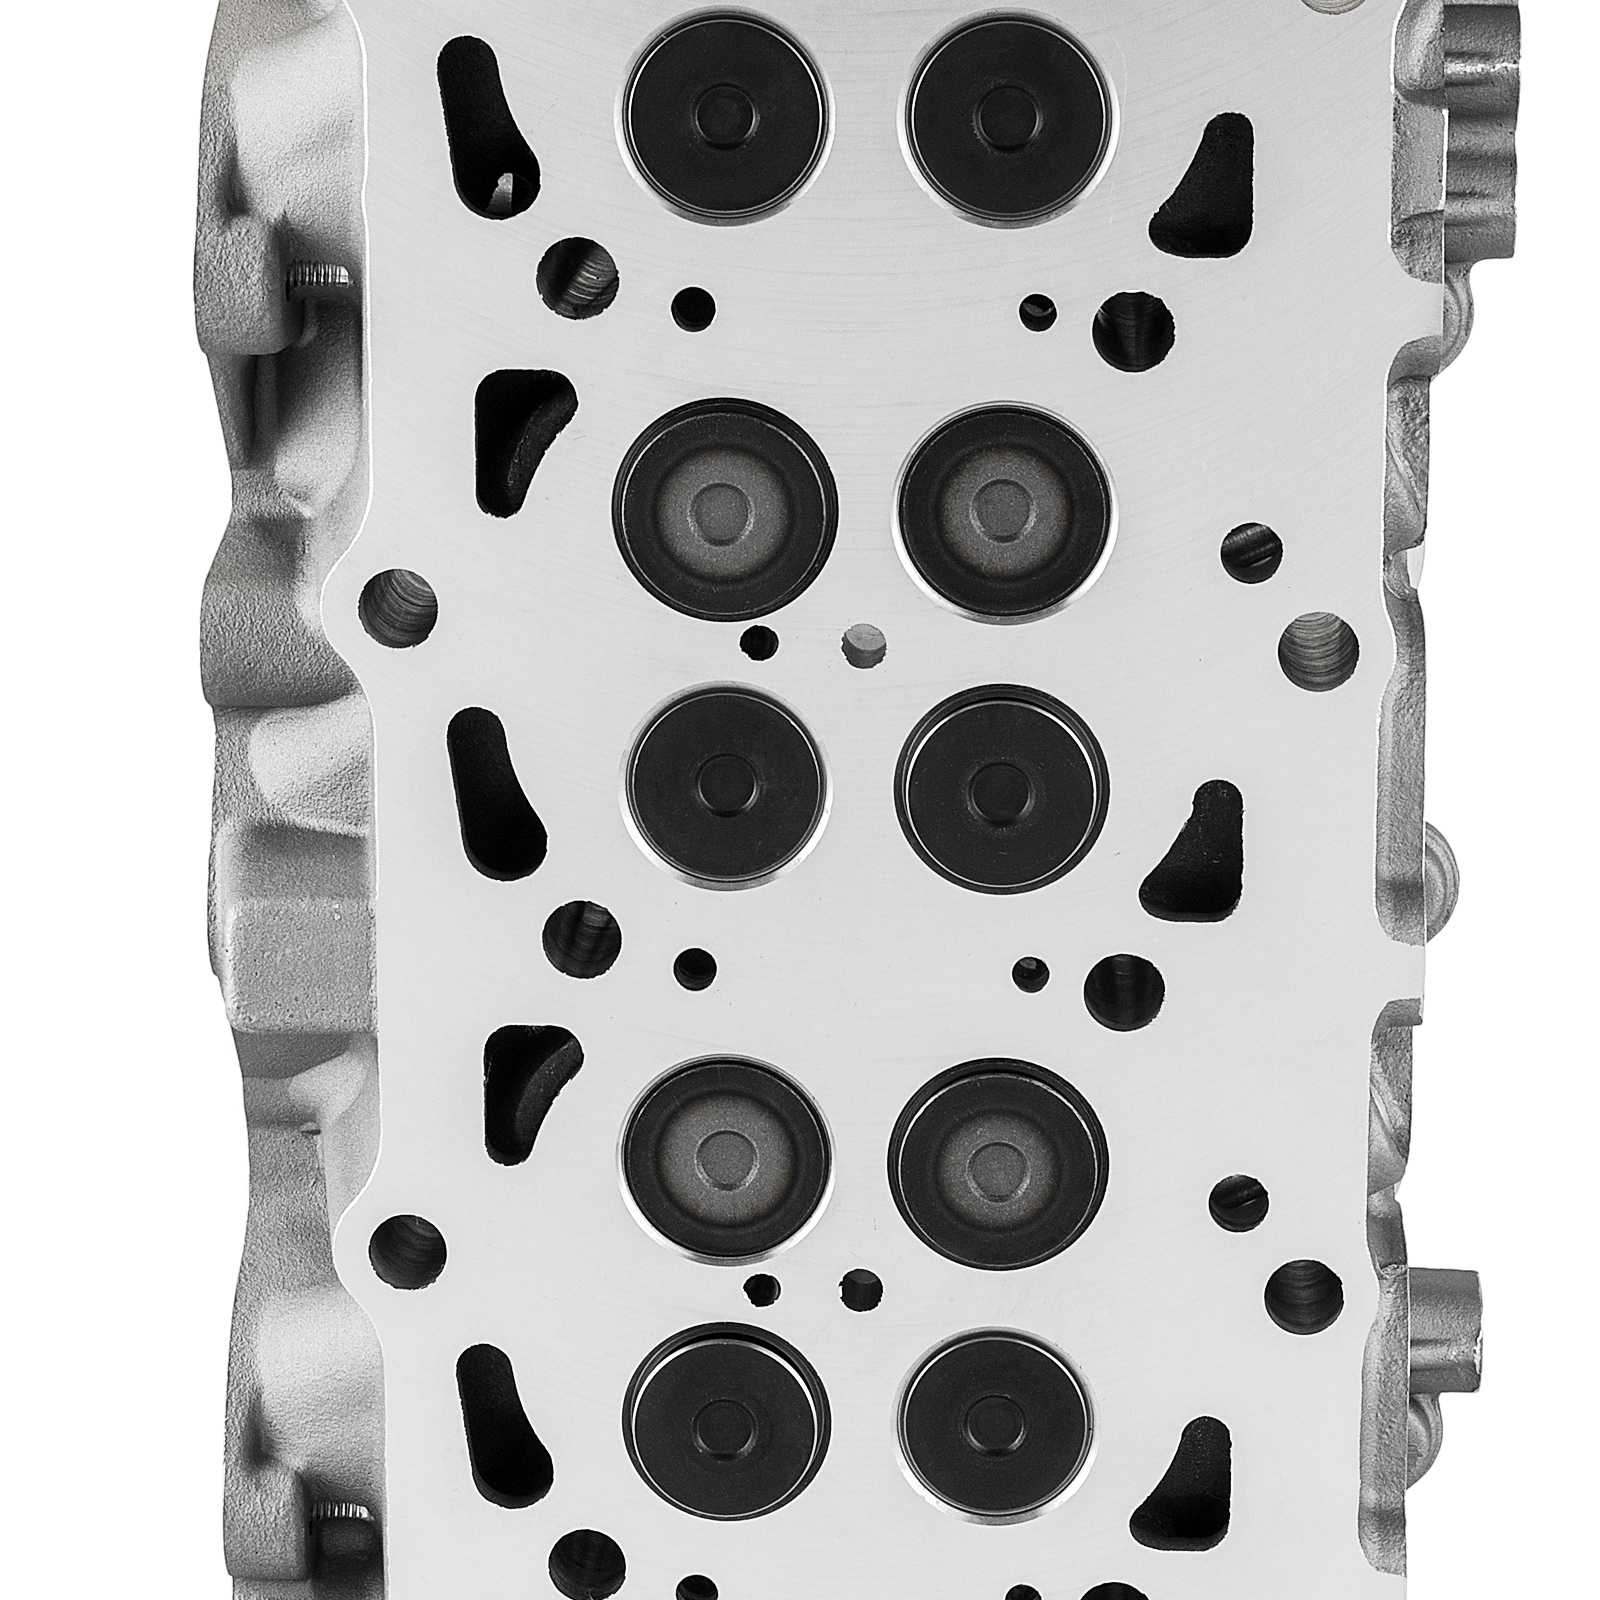 Complete Cylinder Head For Nissan Patrol Navara D22 ZD30 3